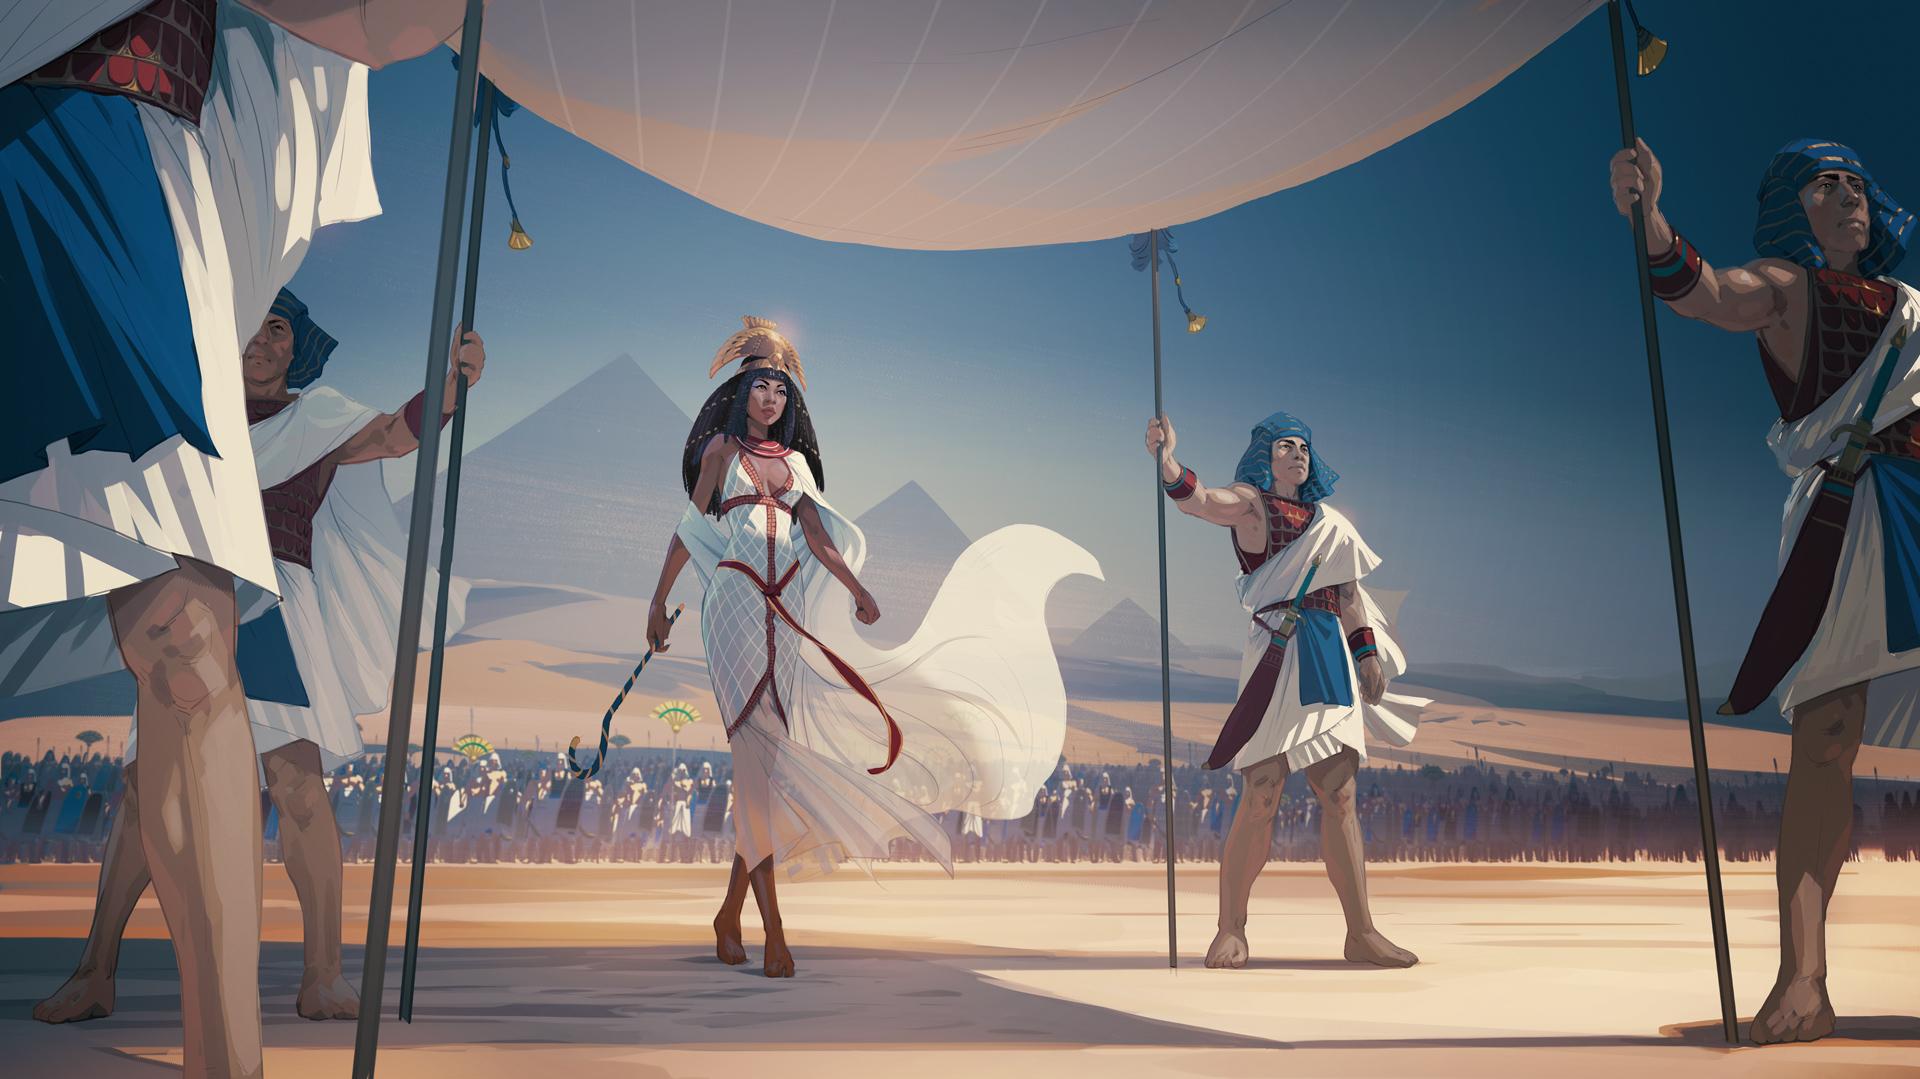 Online Civilization Games - 123-Games.net